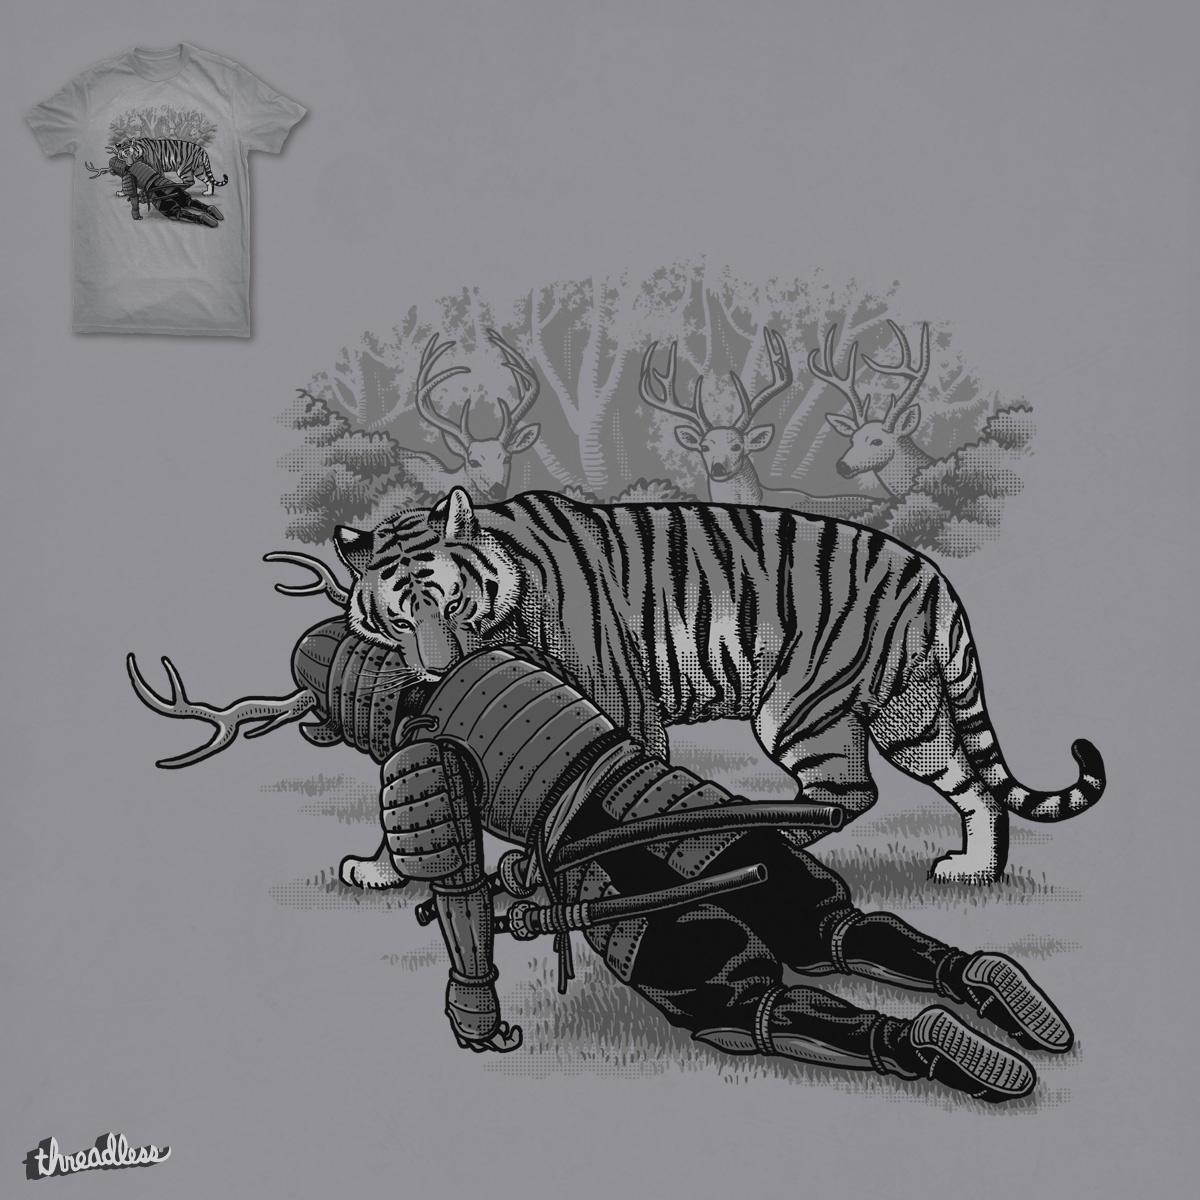 Tiger Eats The Deer by ben chen on Threadless